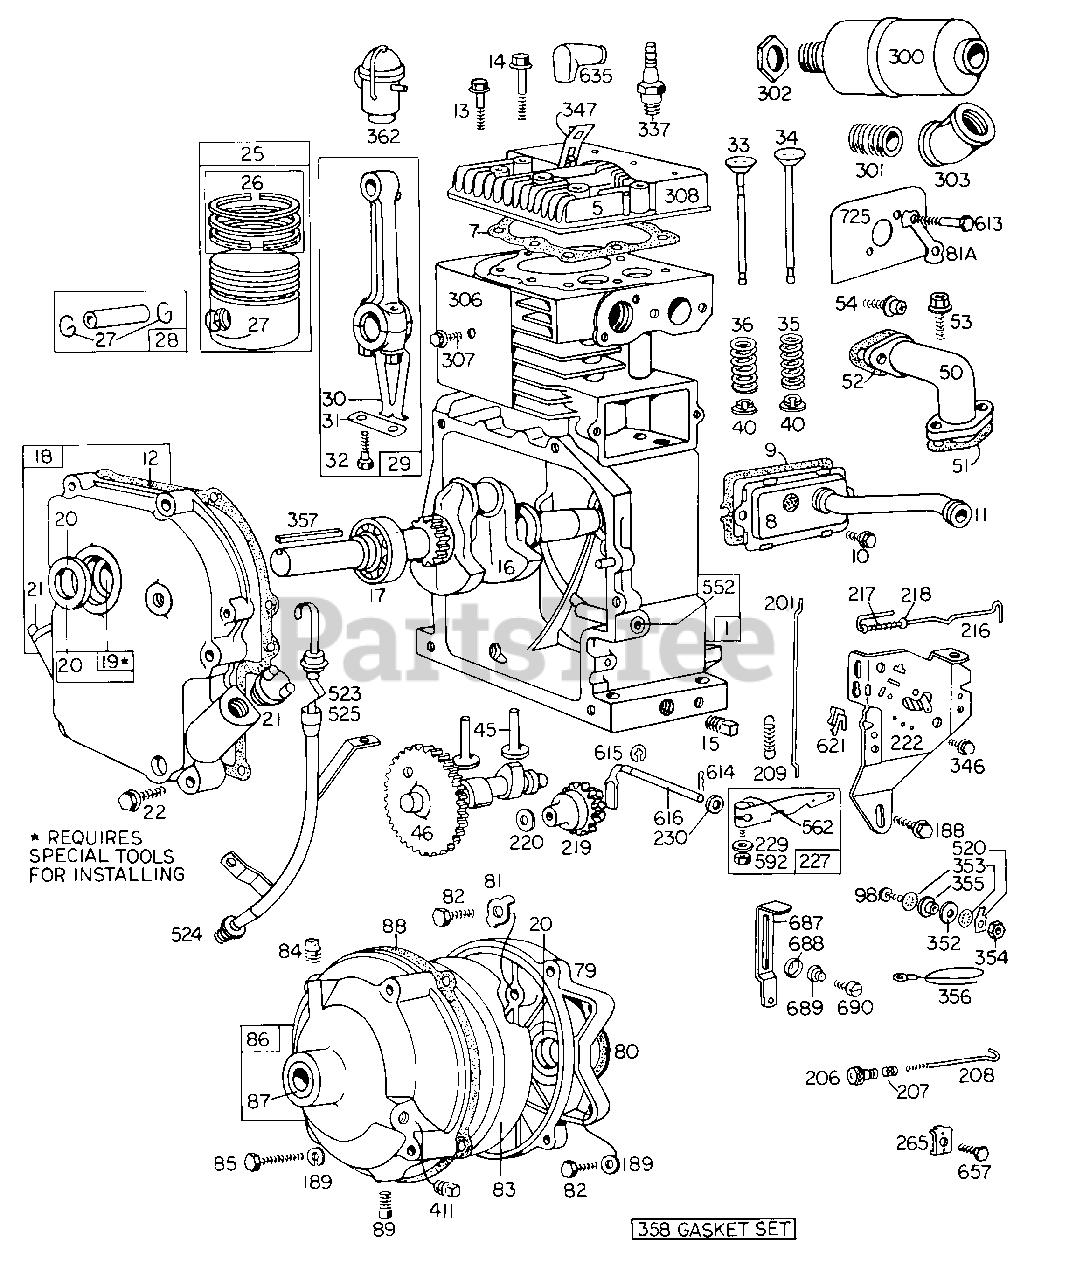 Briggs & Stratton Parts on the Cyl, Piston, ler, CrnkCse ... on